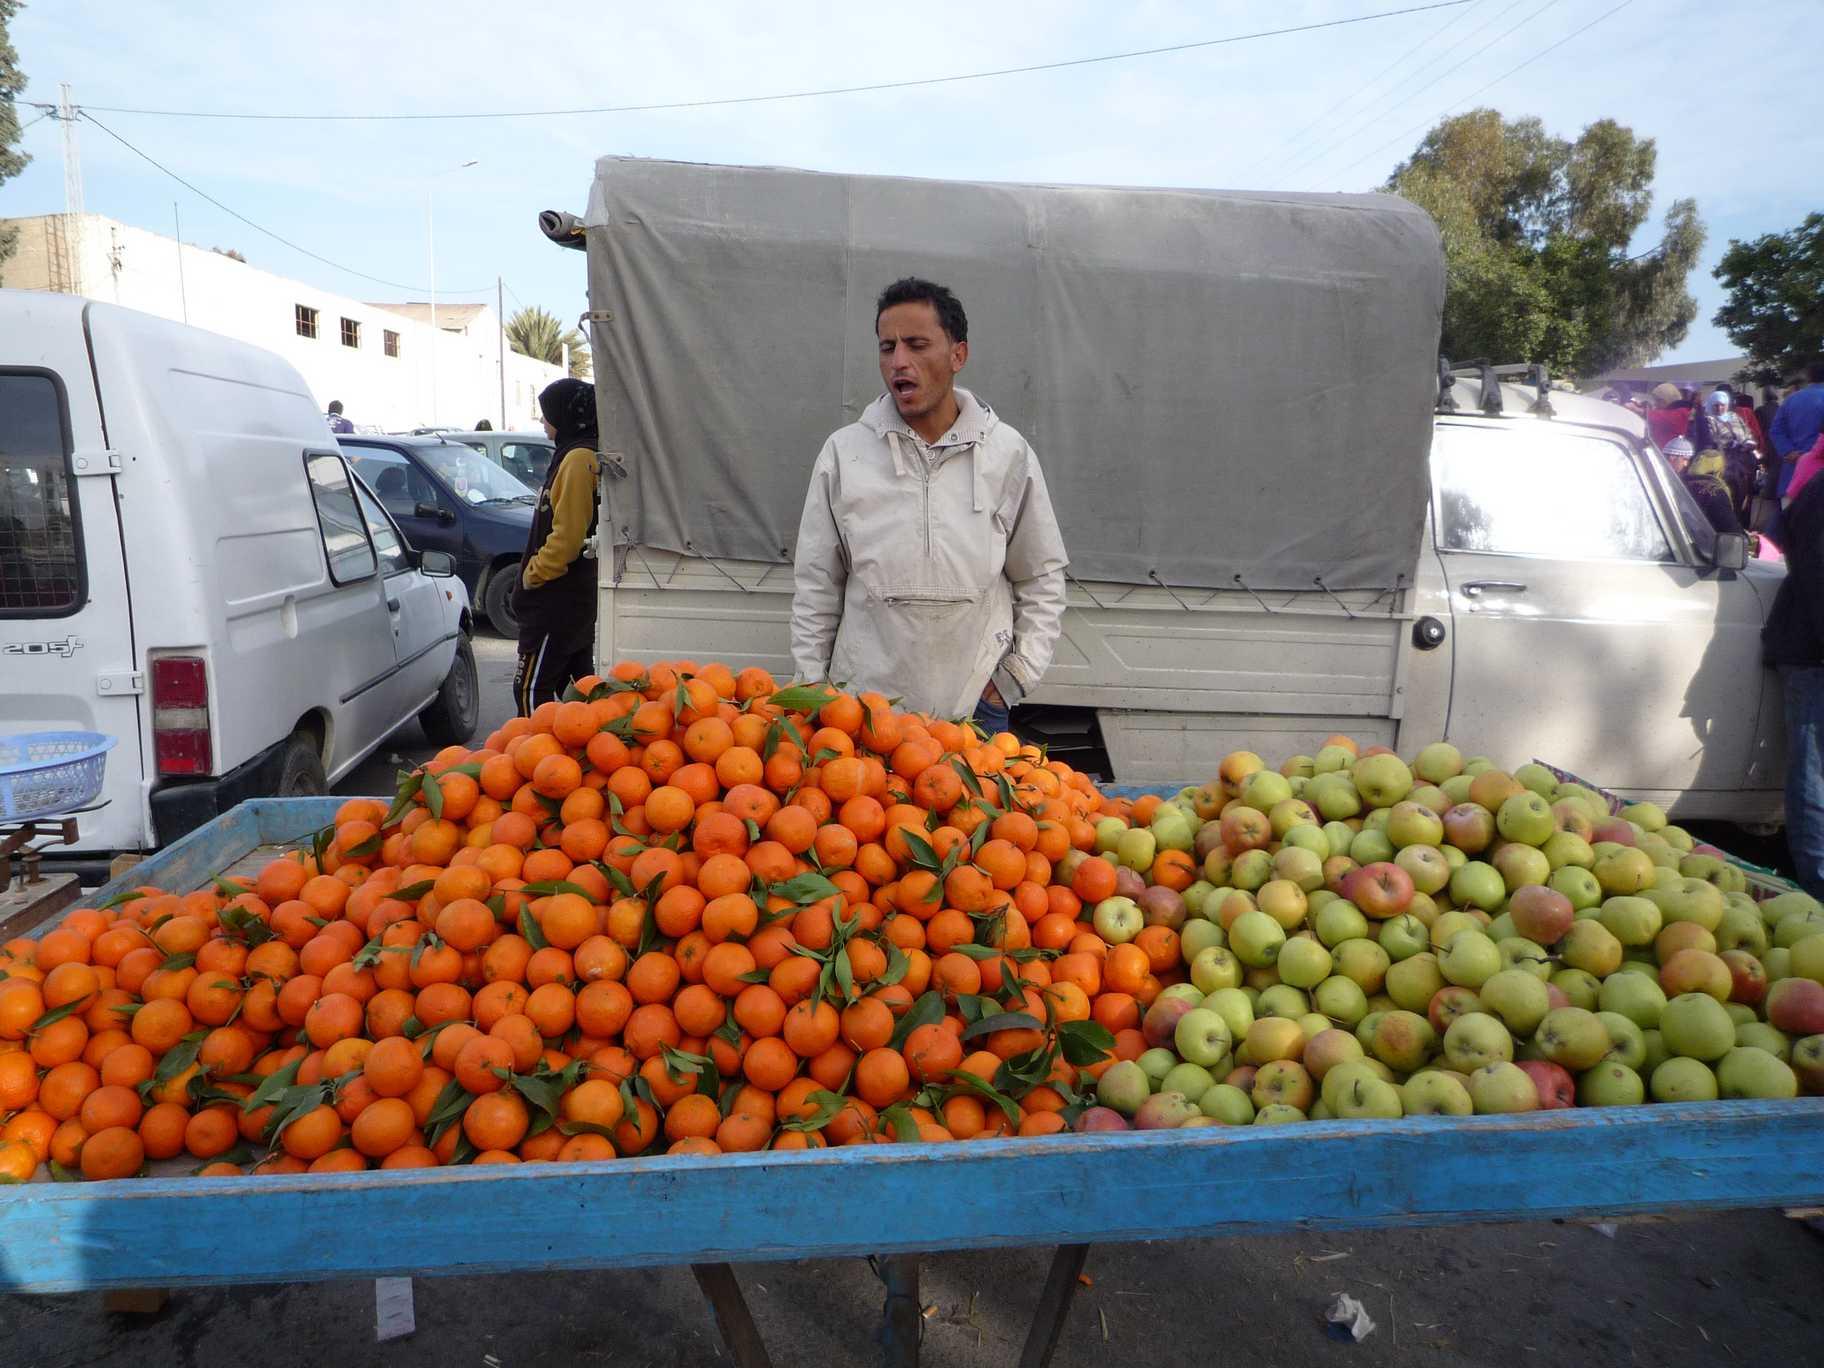 vendeur de maltaise de tunisie